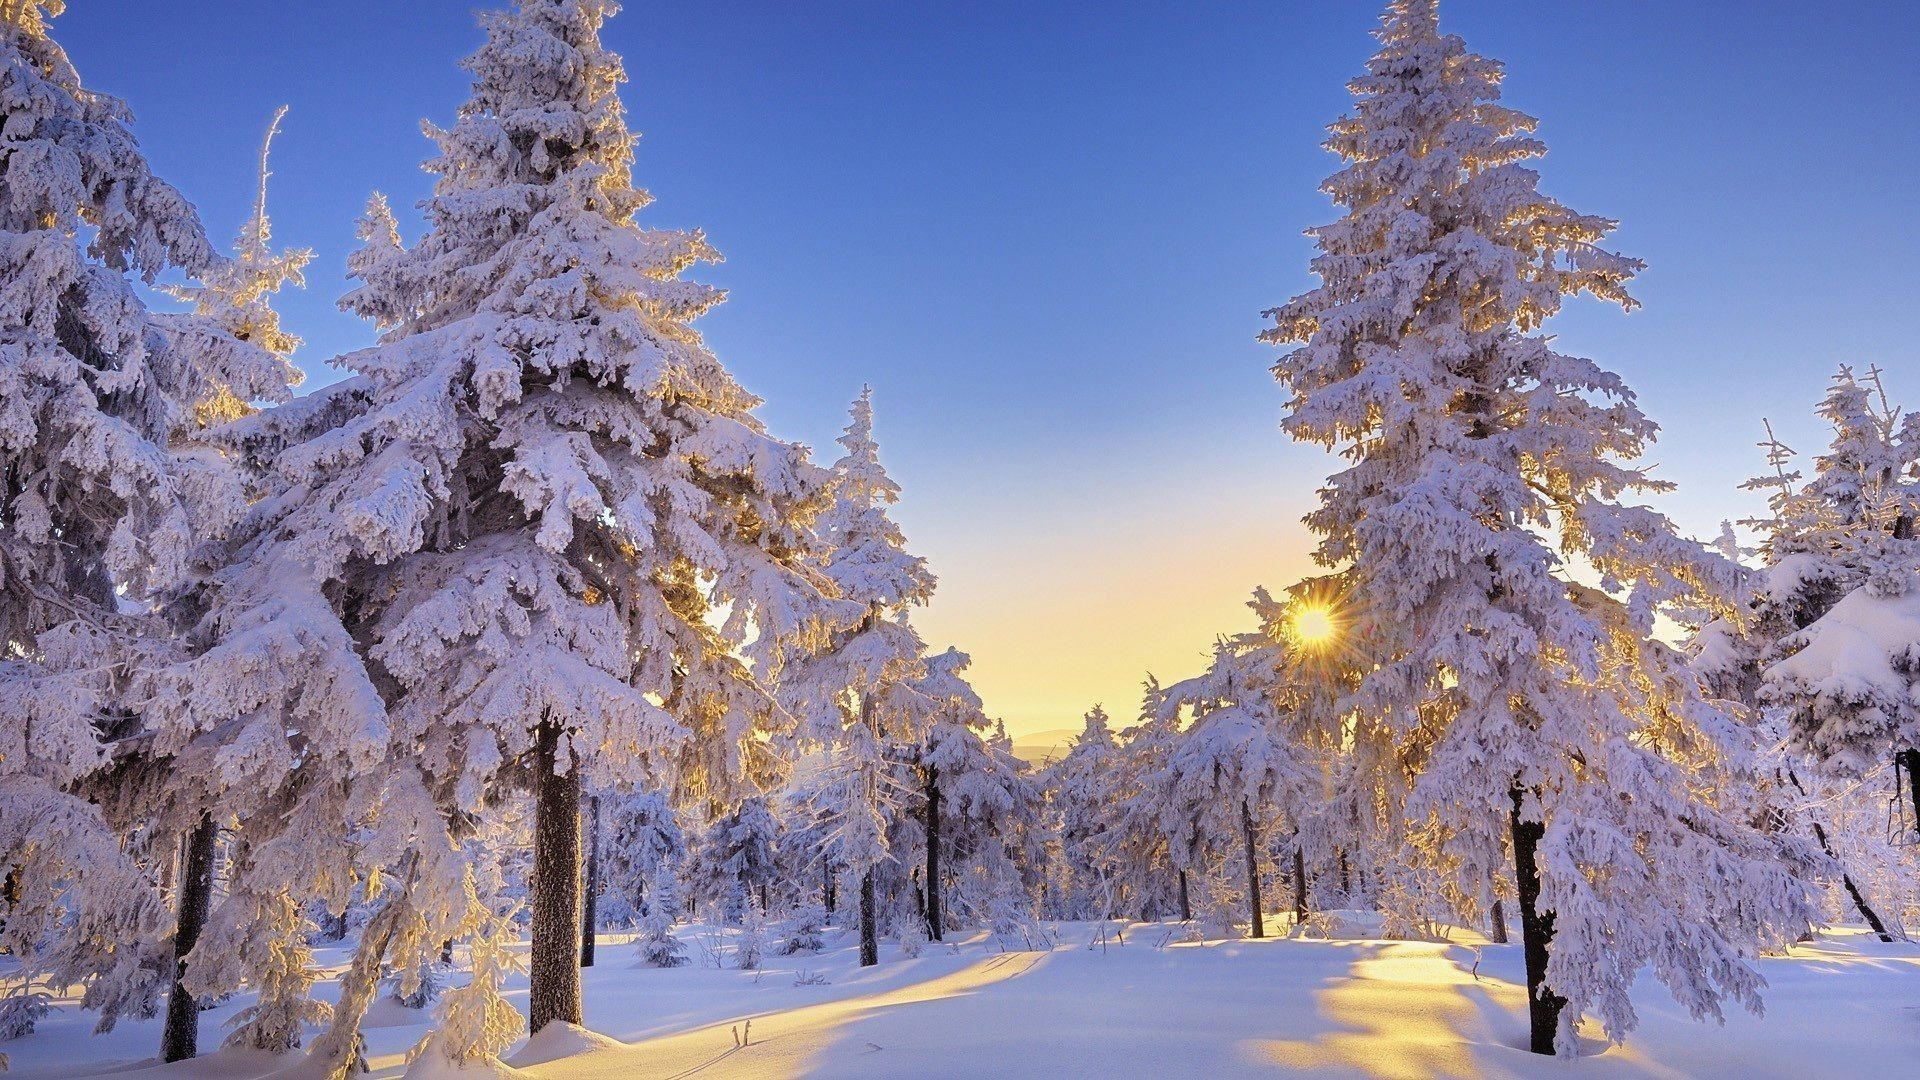 Winter Computer Wallpapers - Top Free ...